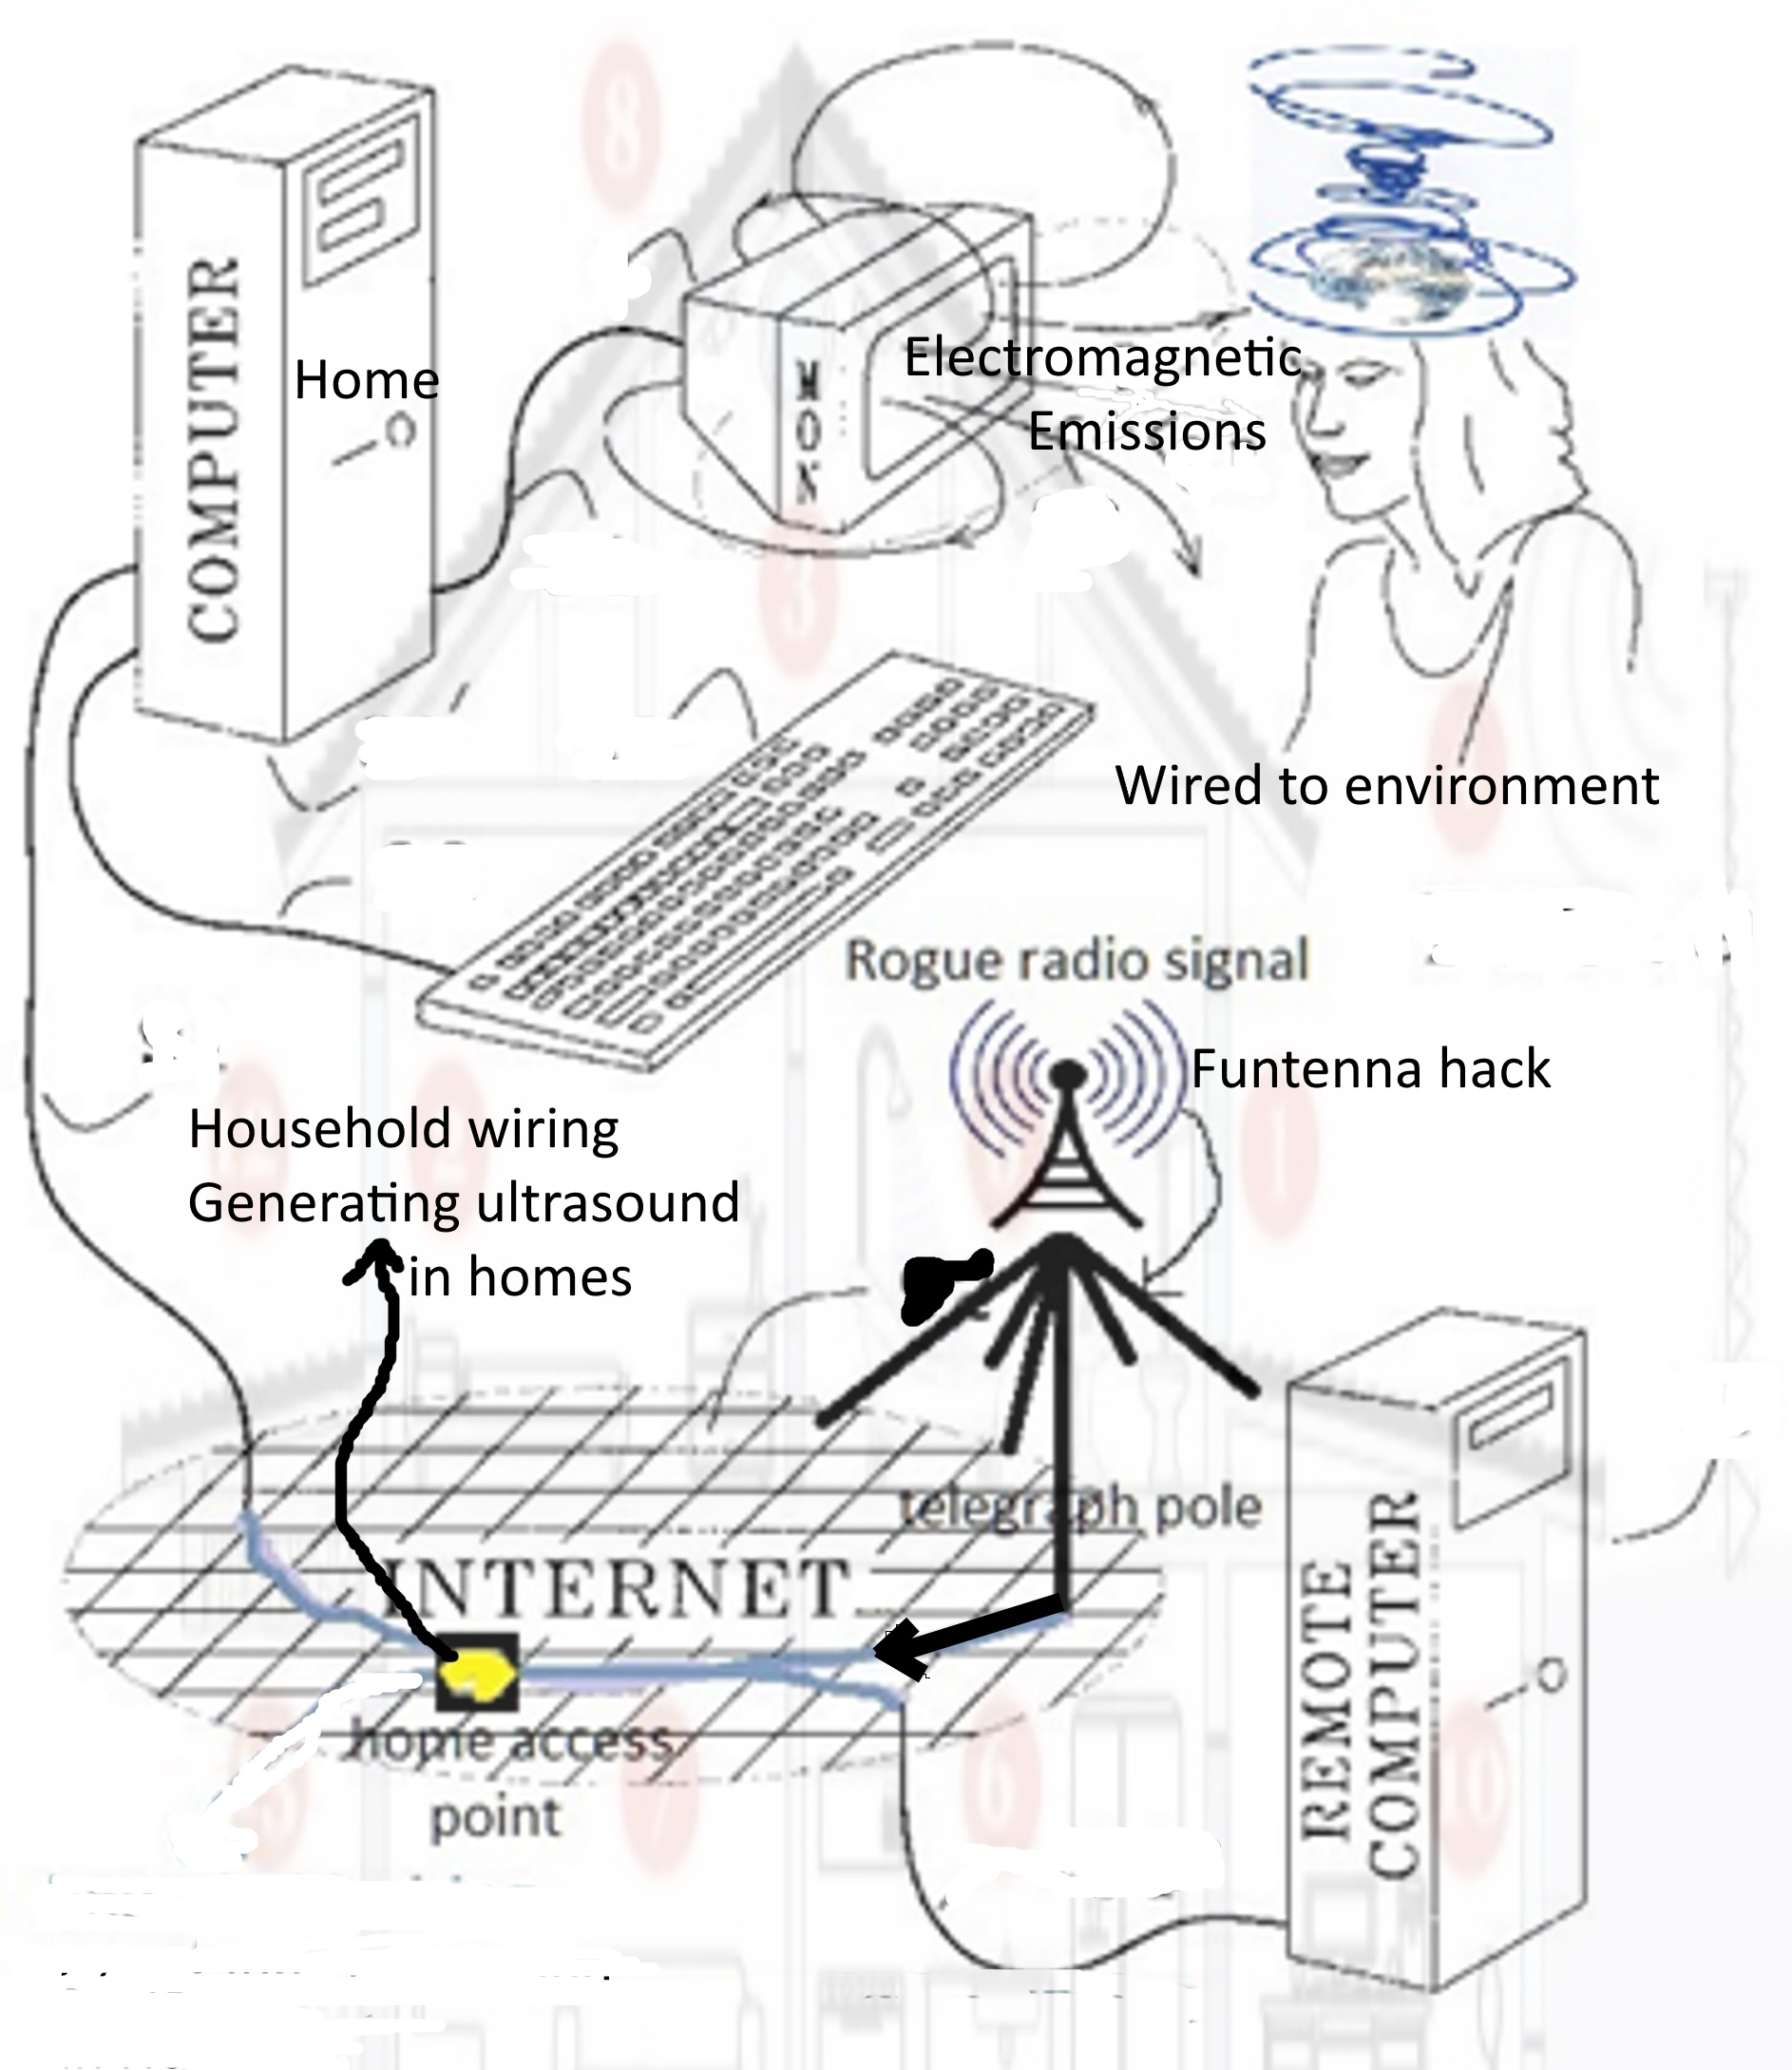 large cat5 network wiring diagrams online wiring diagram Home Network Diagram Examples large cat5 network wiring diagram wiring diagram databaseinternet cable wiring diagram wiring diagram international wiring diagrams